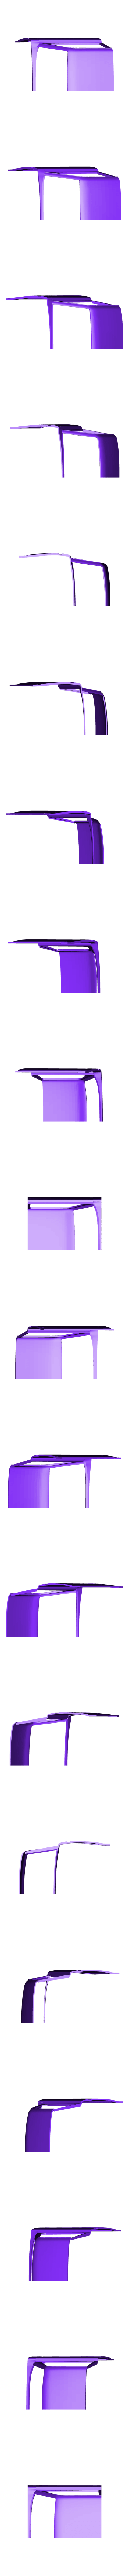 Lada_Niva (2).stl Download STL file Lada Niva  • 3D printing template, serega1337